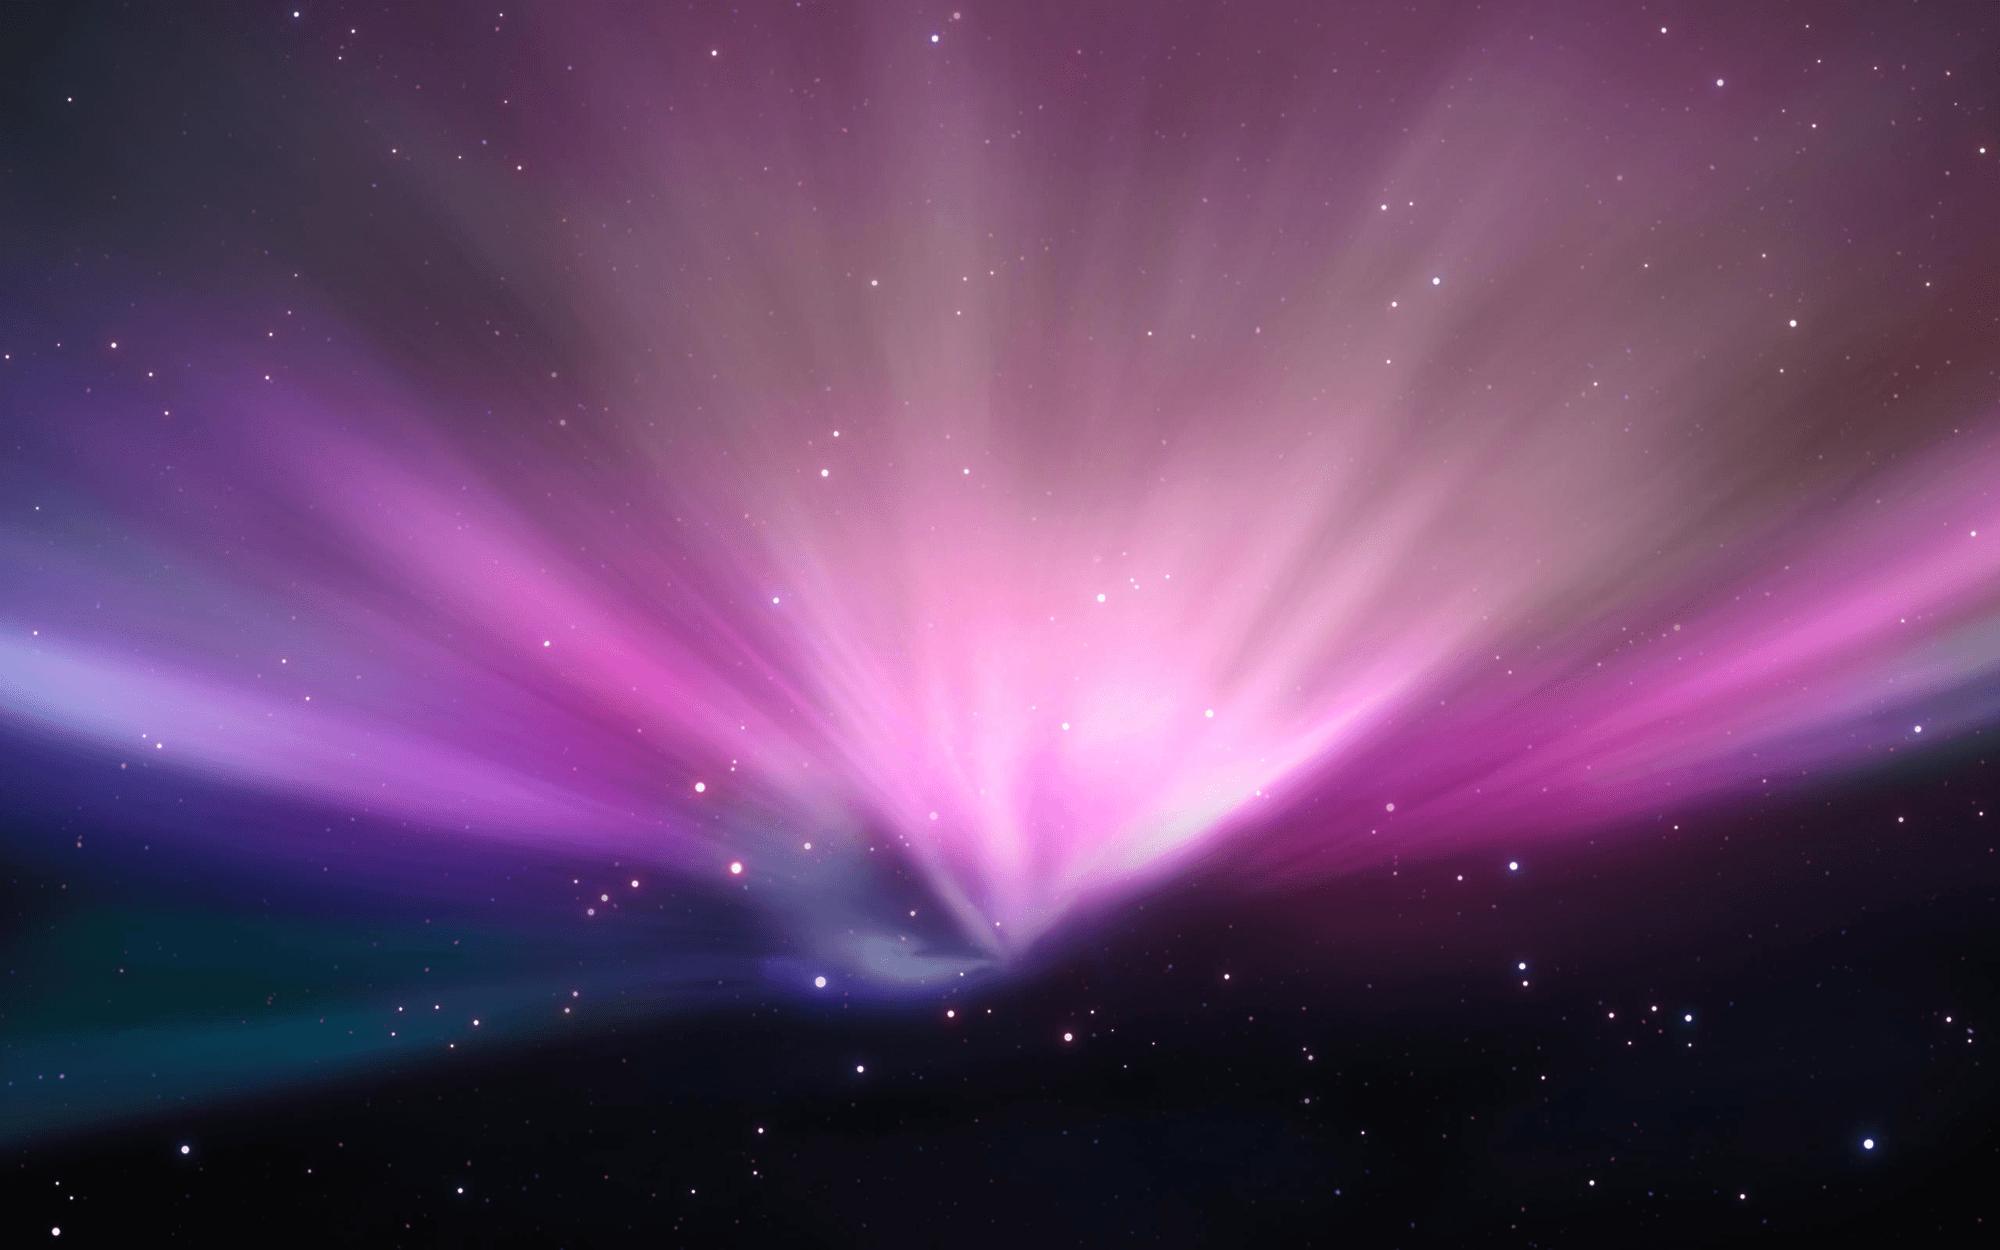 78] Apple Desktop Backgrounds on WallpaperSafari 2000x1250